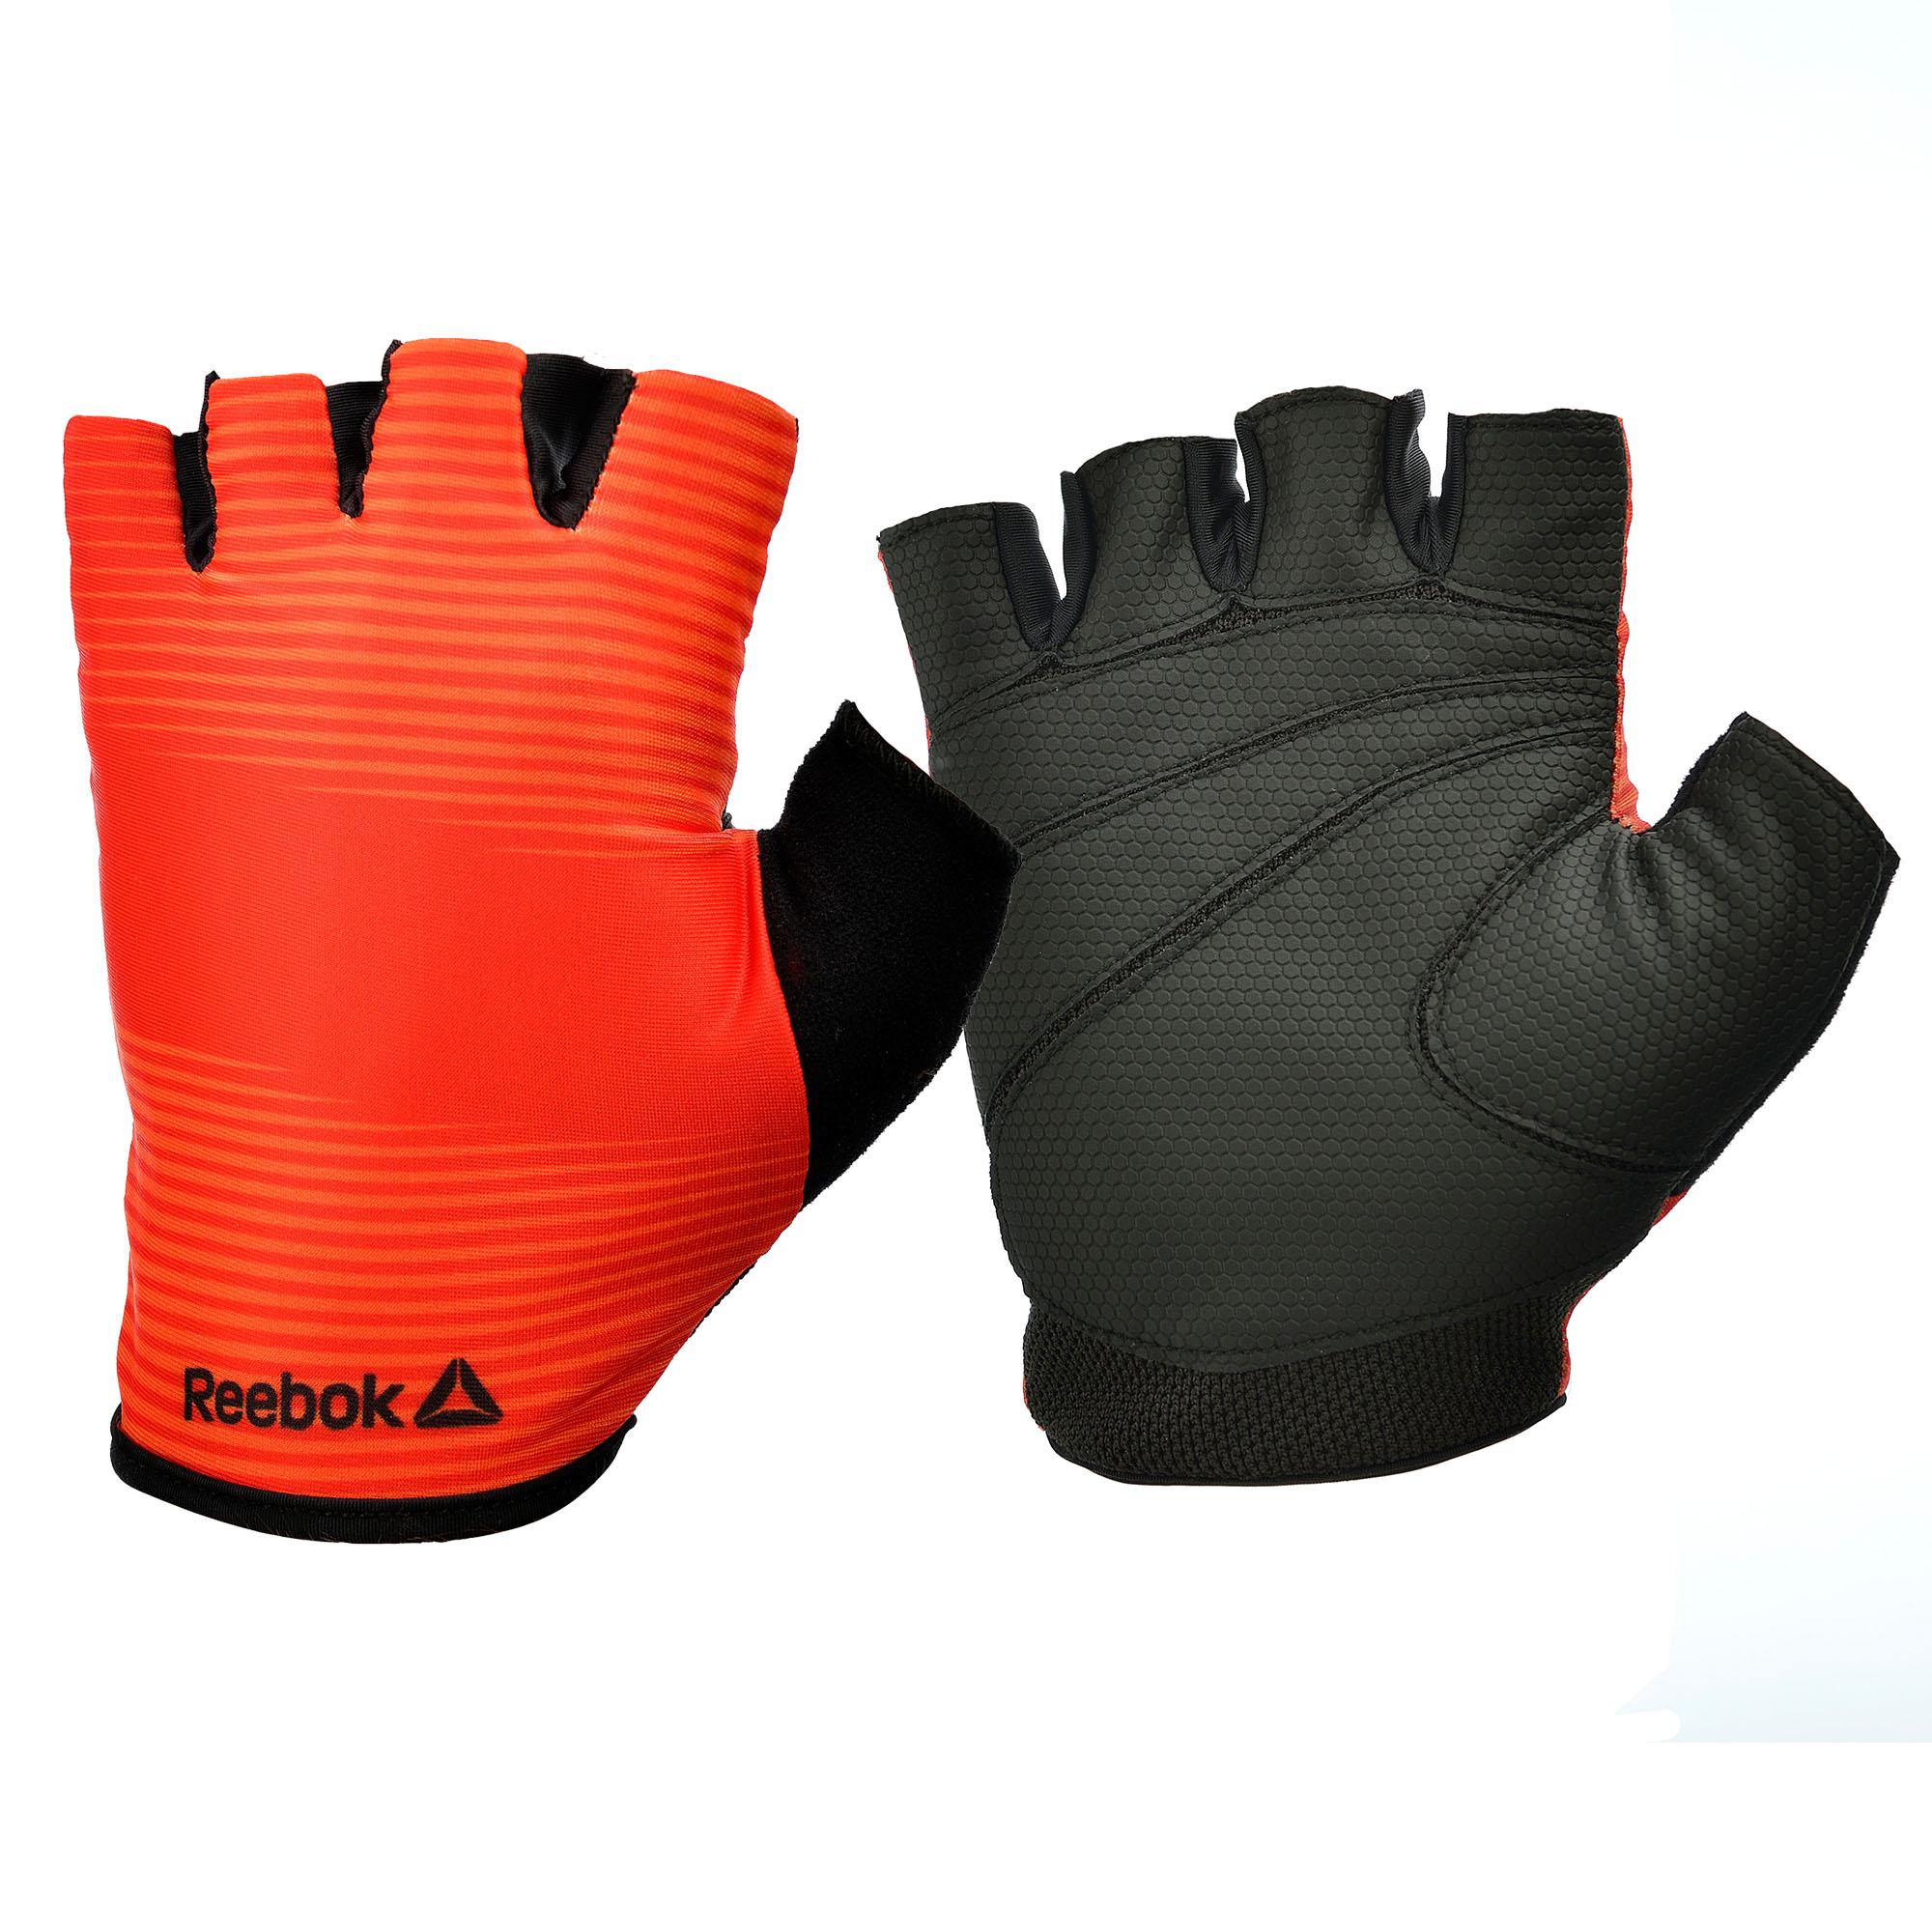 d48acbc8bad0e Reebok Mens Training Gloves M